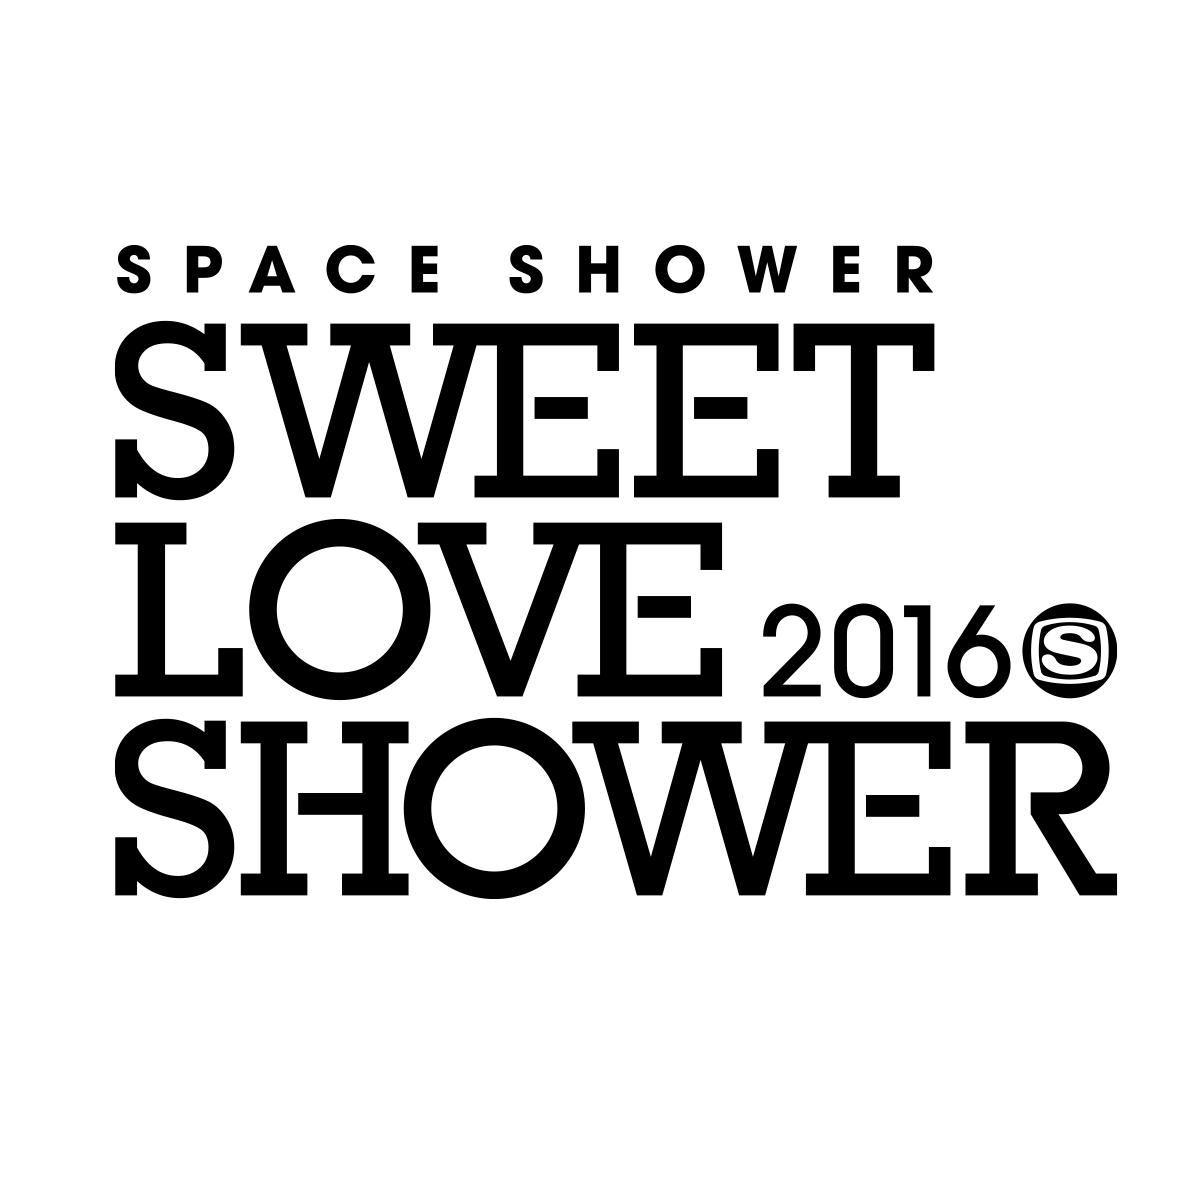 SWEET LOVE SHOWER 2016